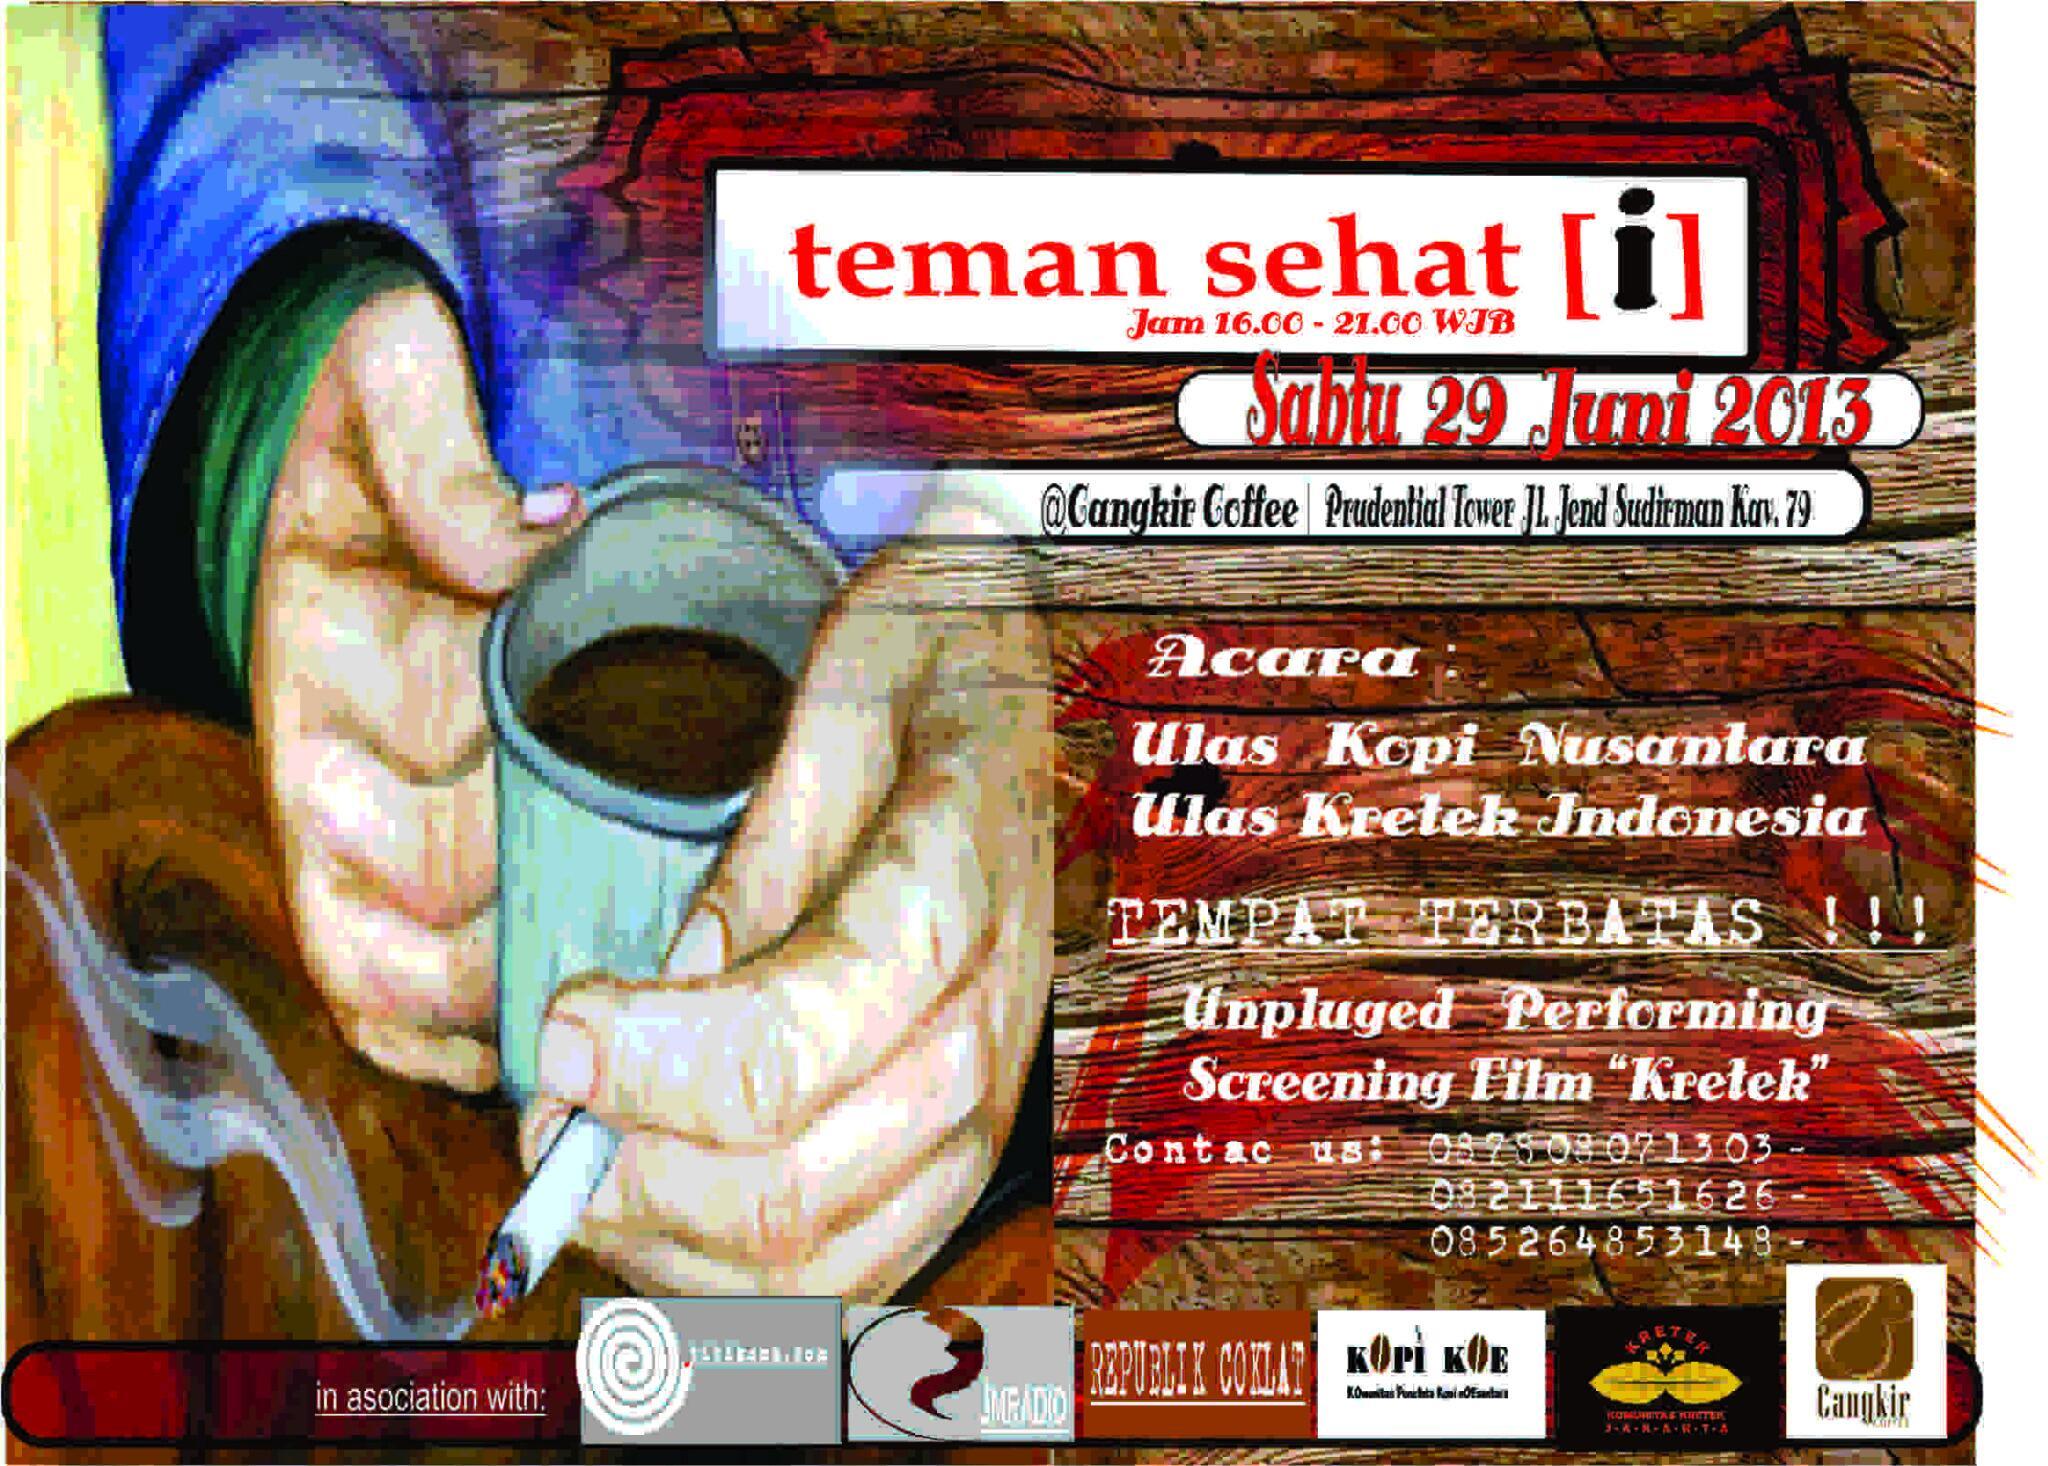 acara workshop dan gathering bareng pecinta kopi dan kretek,29-06-2013,@KomunitasKretek http://t.co/vUZIT1d5ne